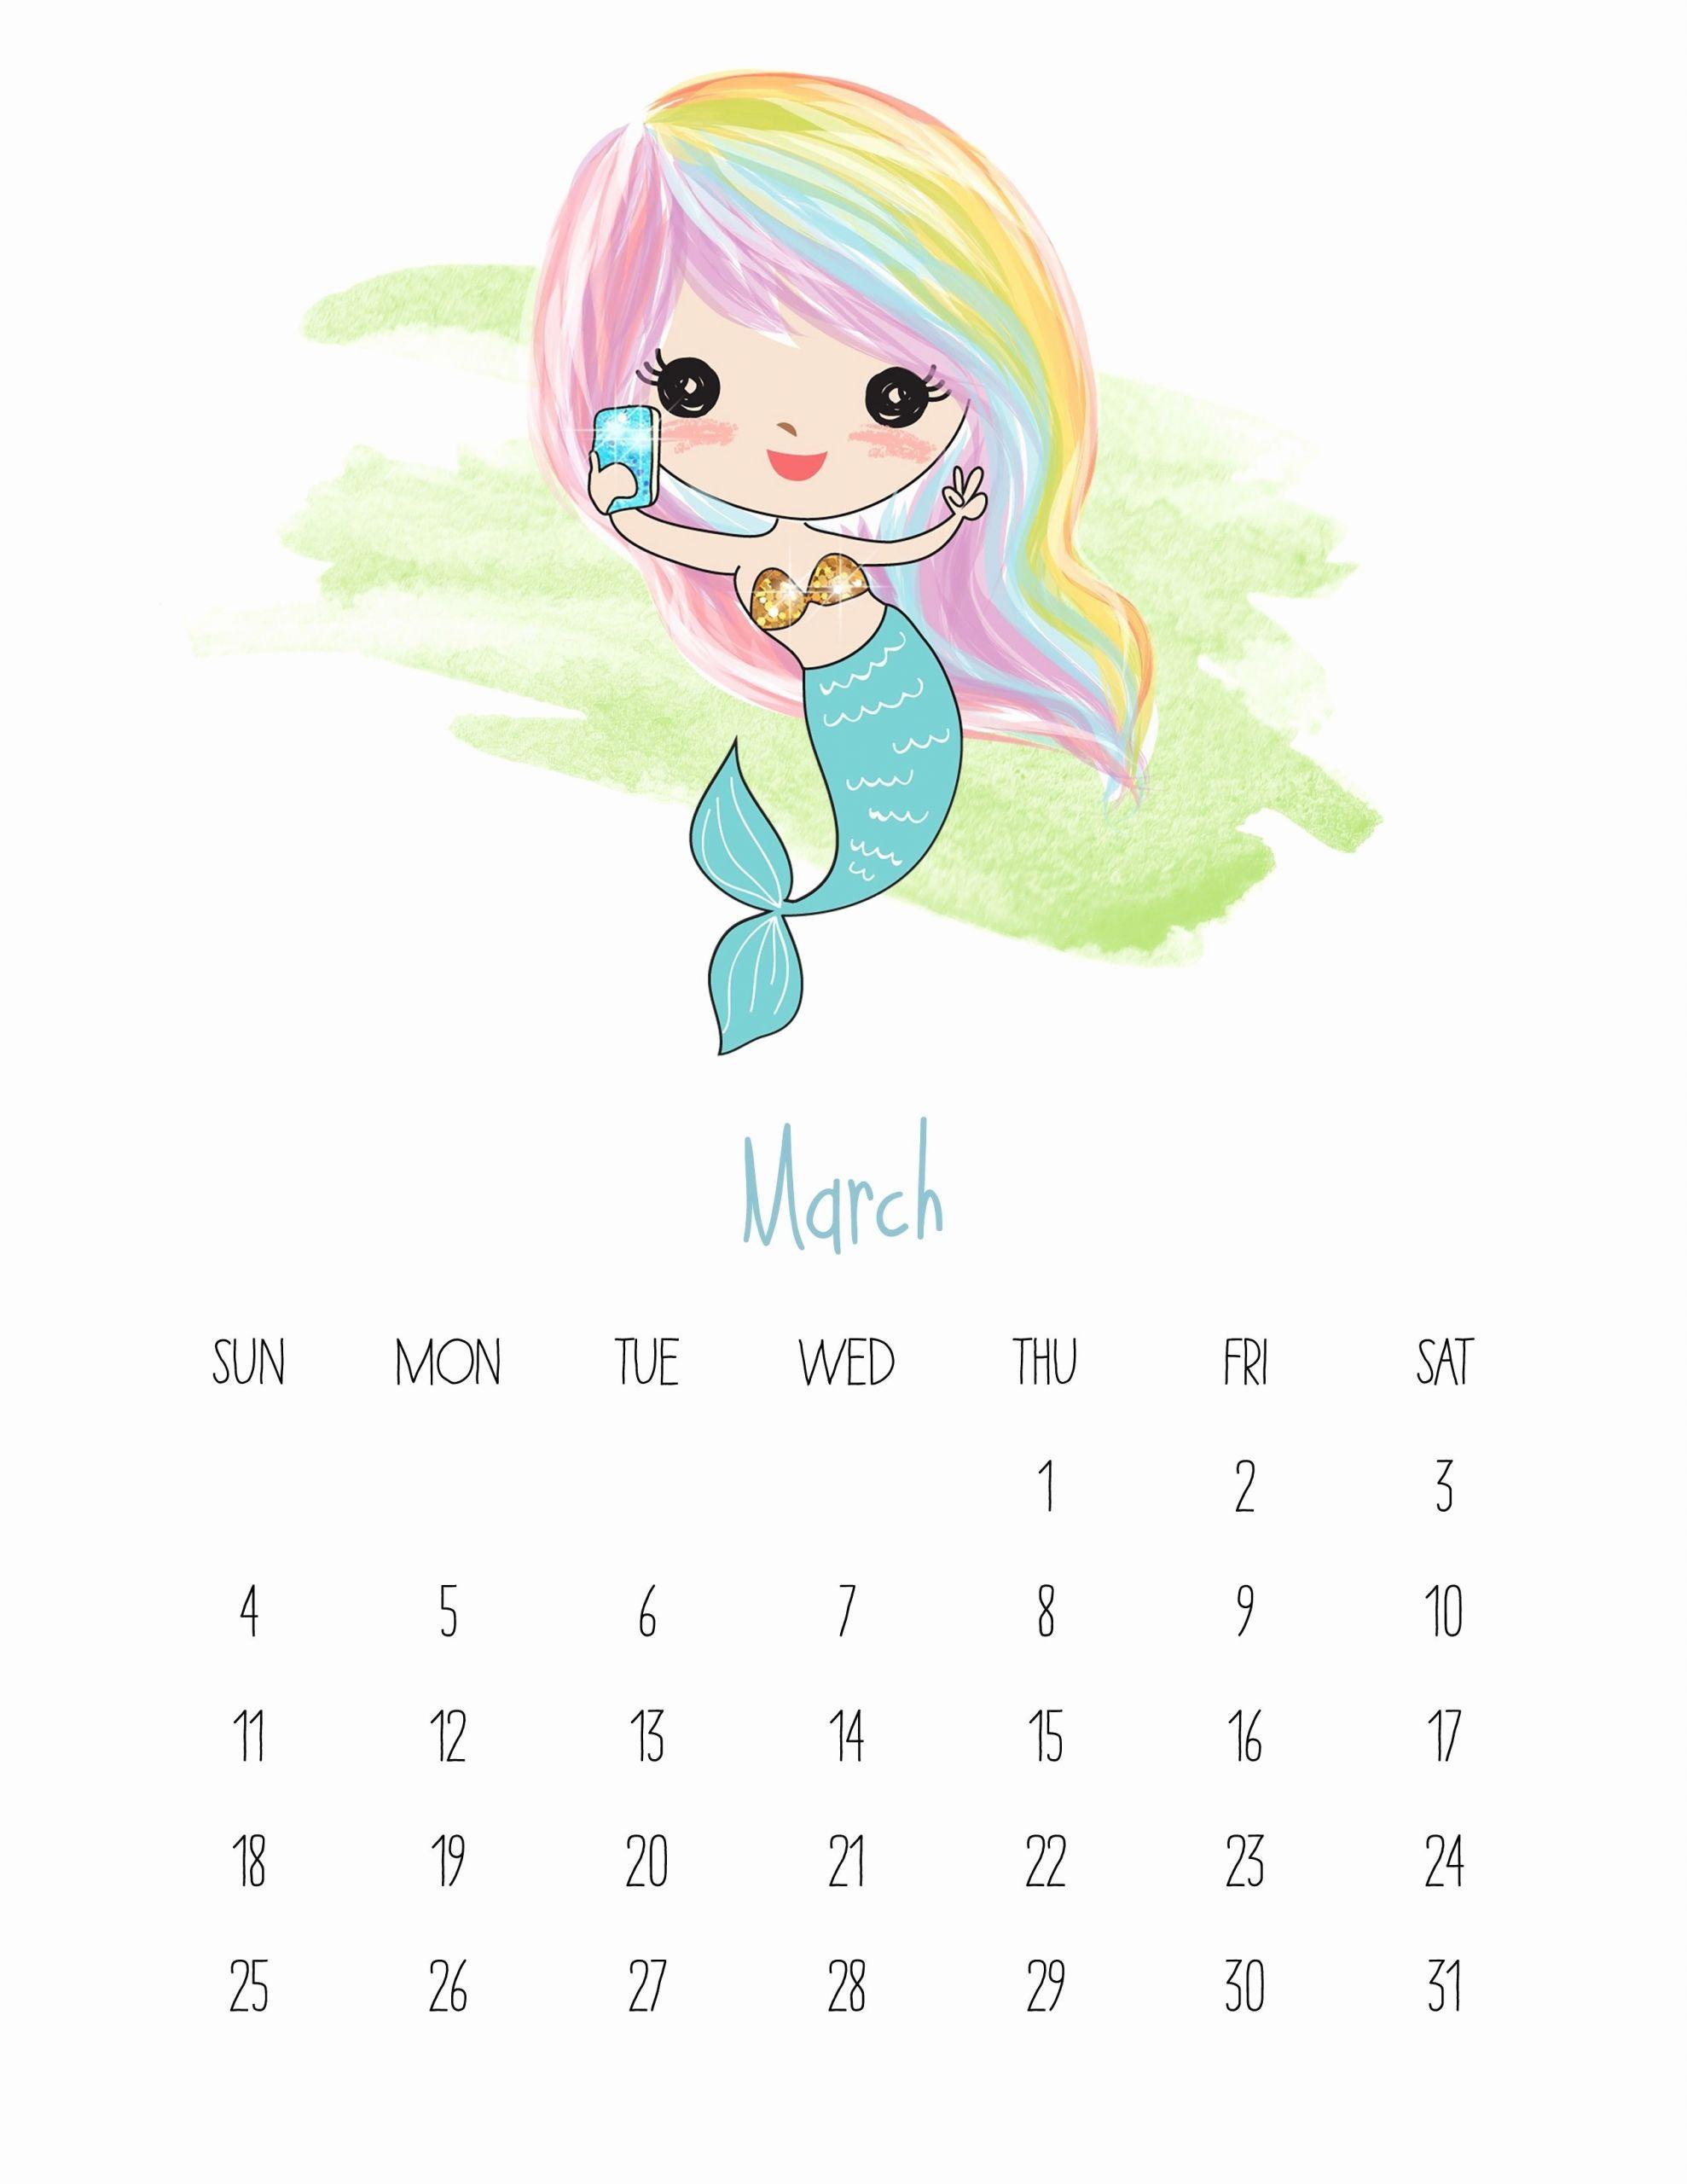 march 3rd calendar mas recientemente liberado kalender ausdrucken 2015 schon printable 0d calendars kalender of march 3rd calendar